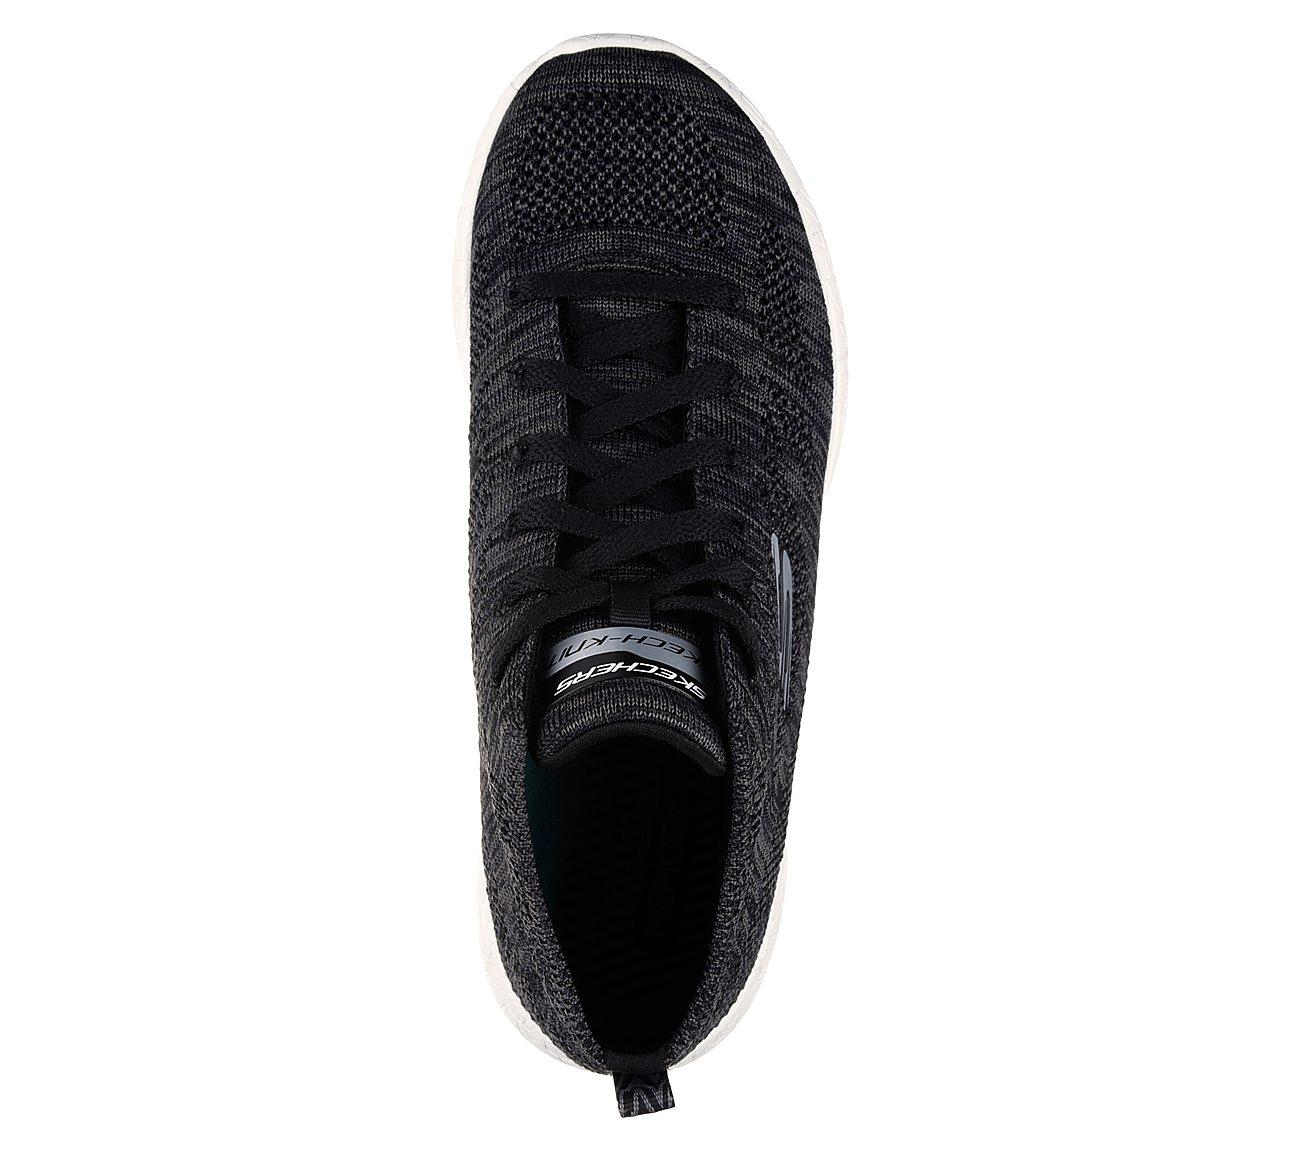 c549bf12a6d8 Buy SKECHERS Burst - Divergent Sport Shoes only  80.00